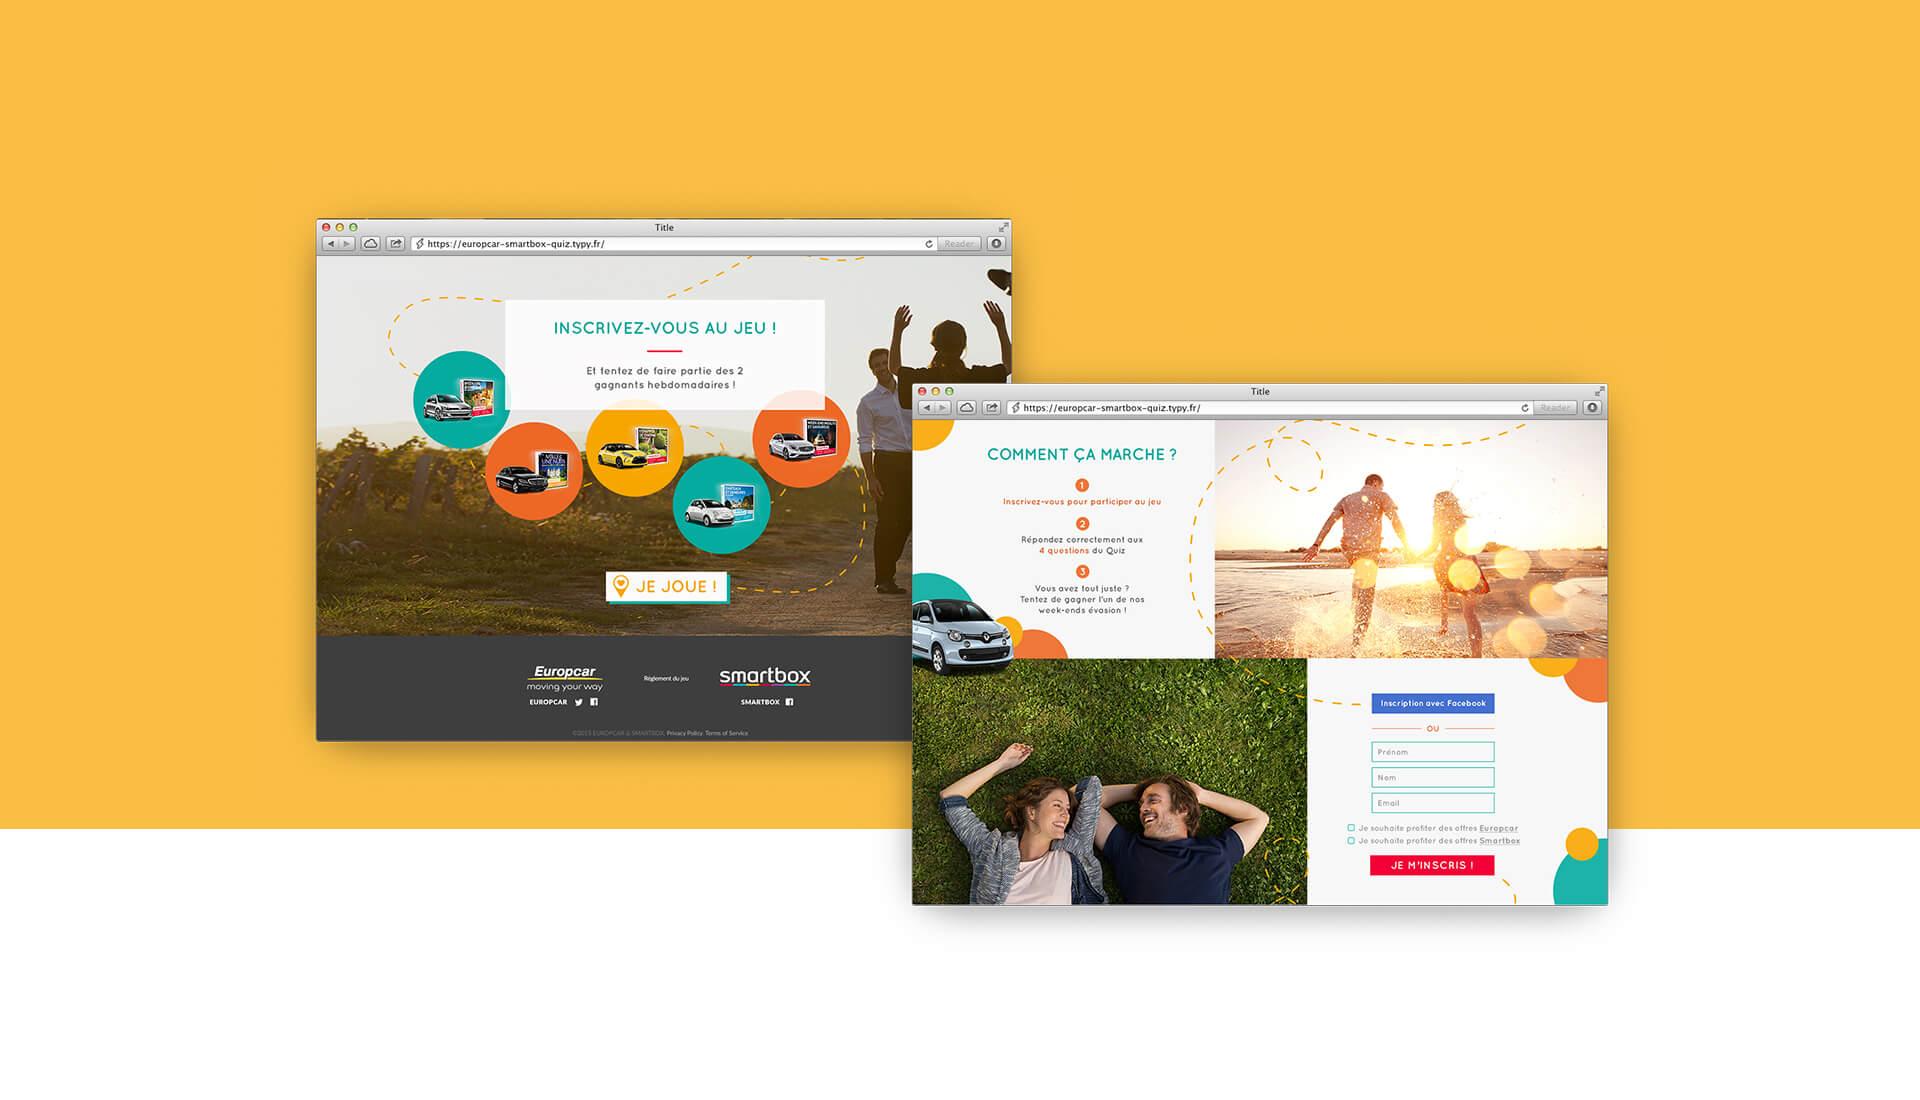 Europcar Smartbox - stratégie de communication Sharing Agency